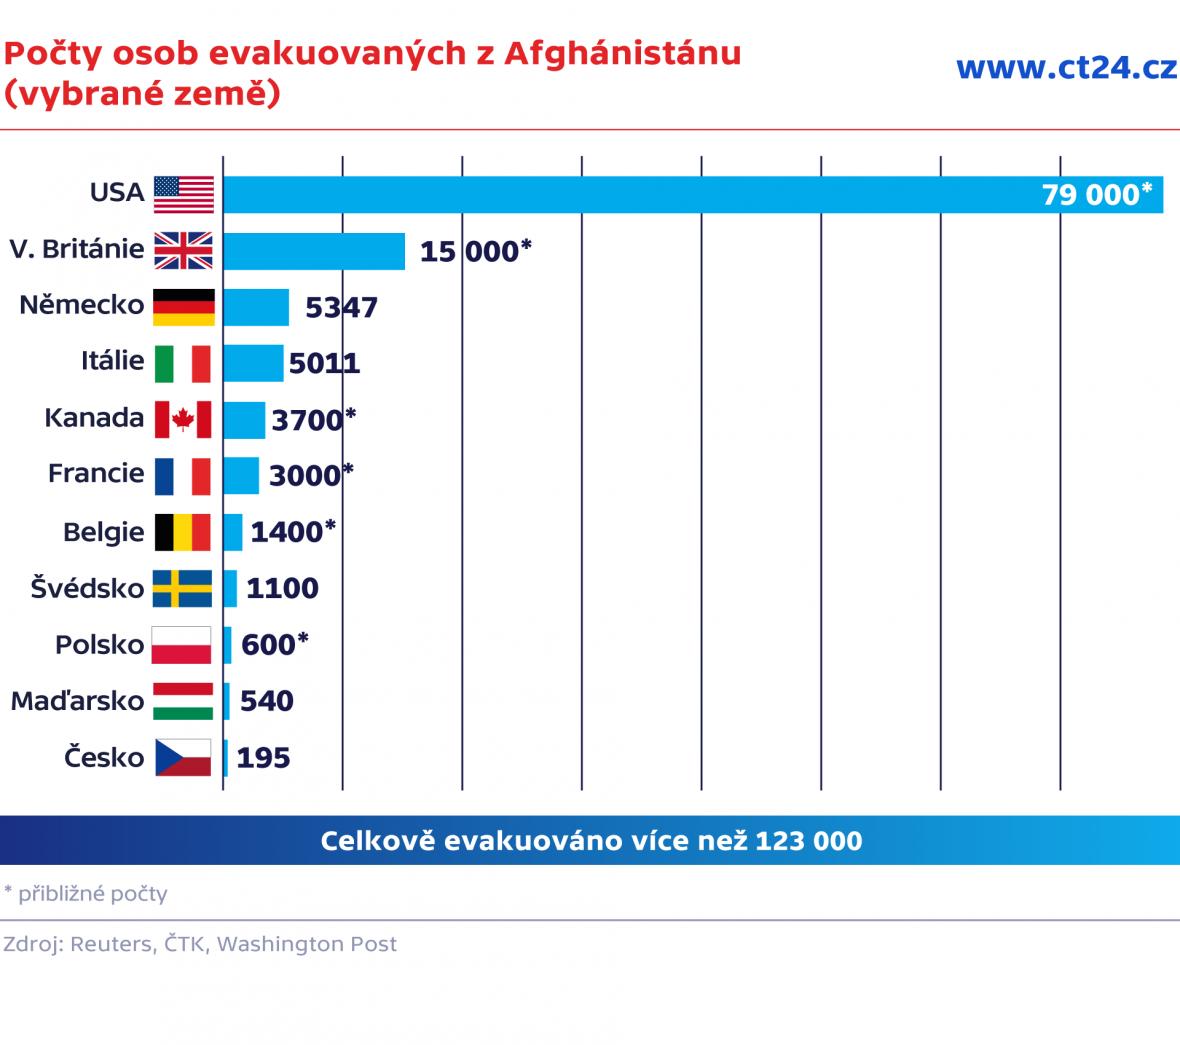 Počty osob evakuovaných z Afghánistánu (vybrané země)